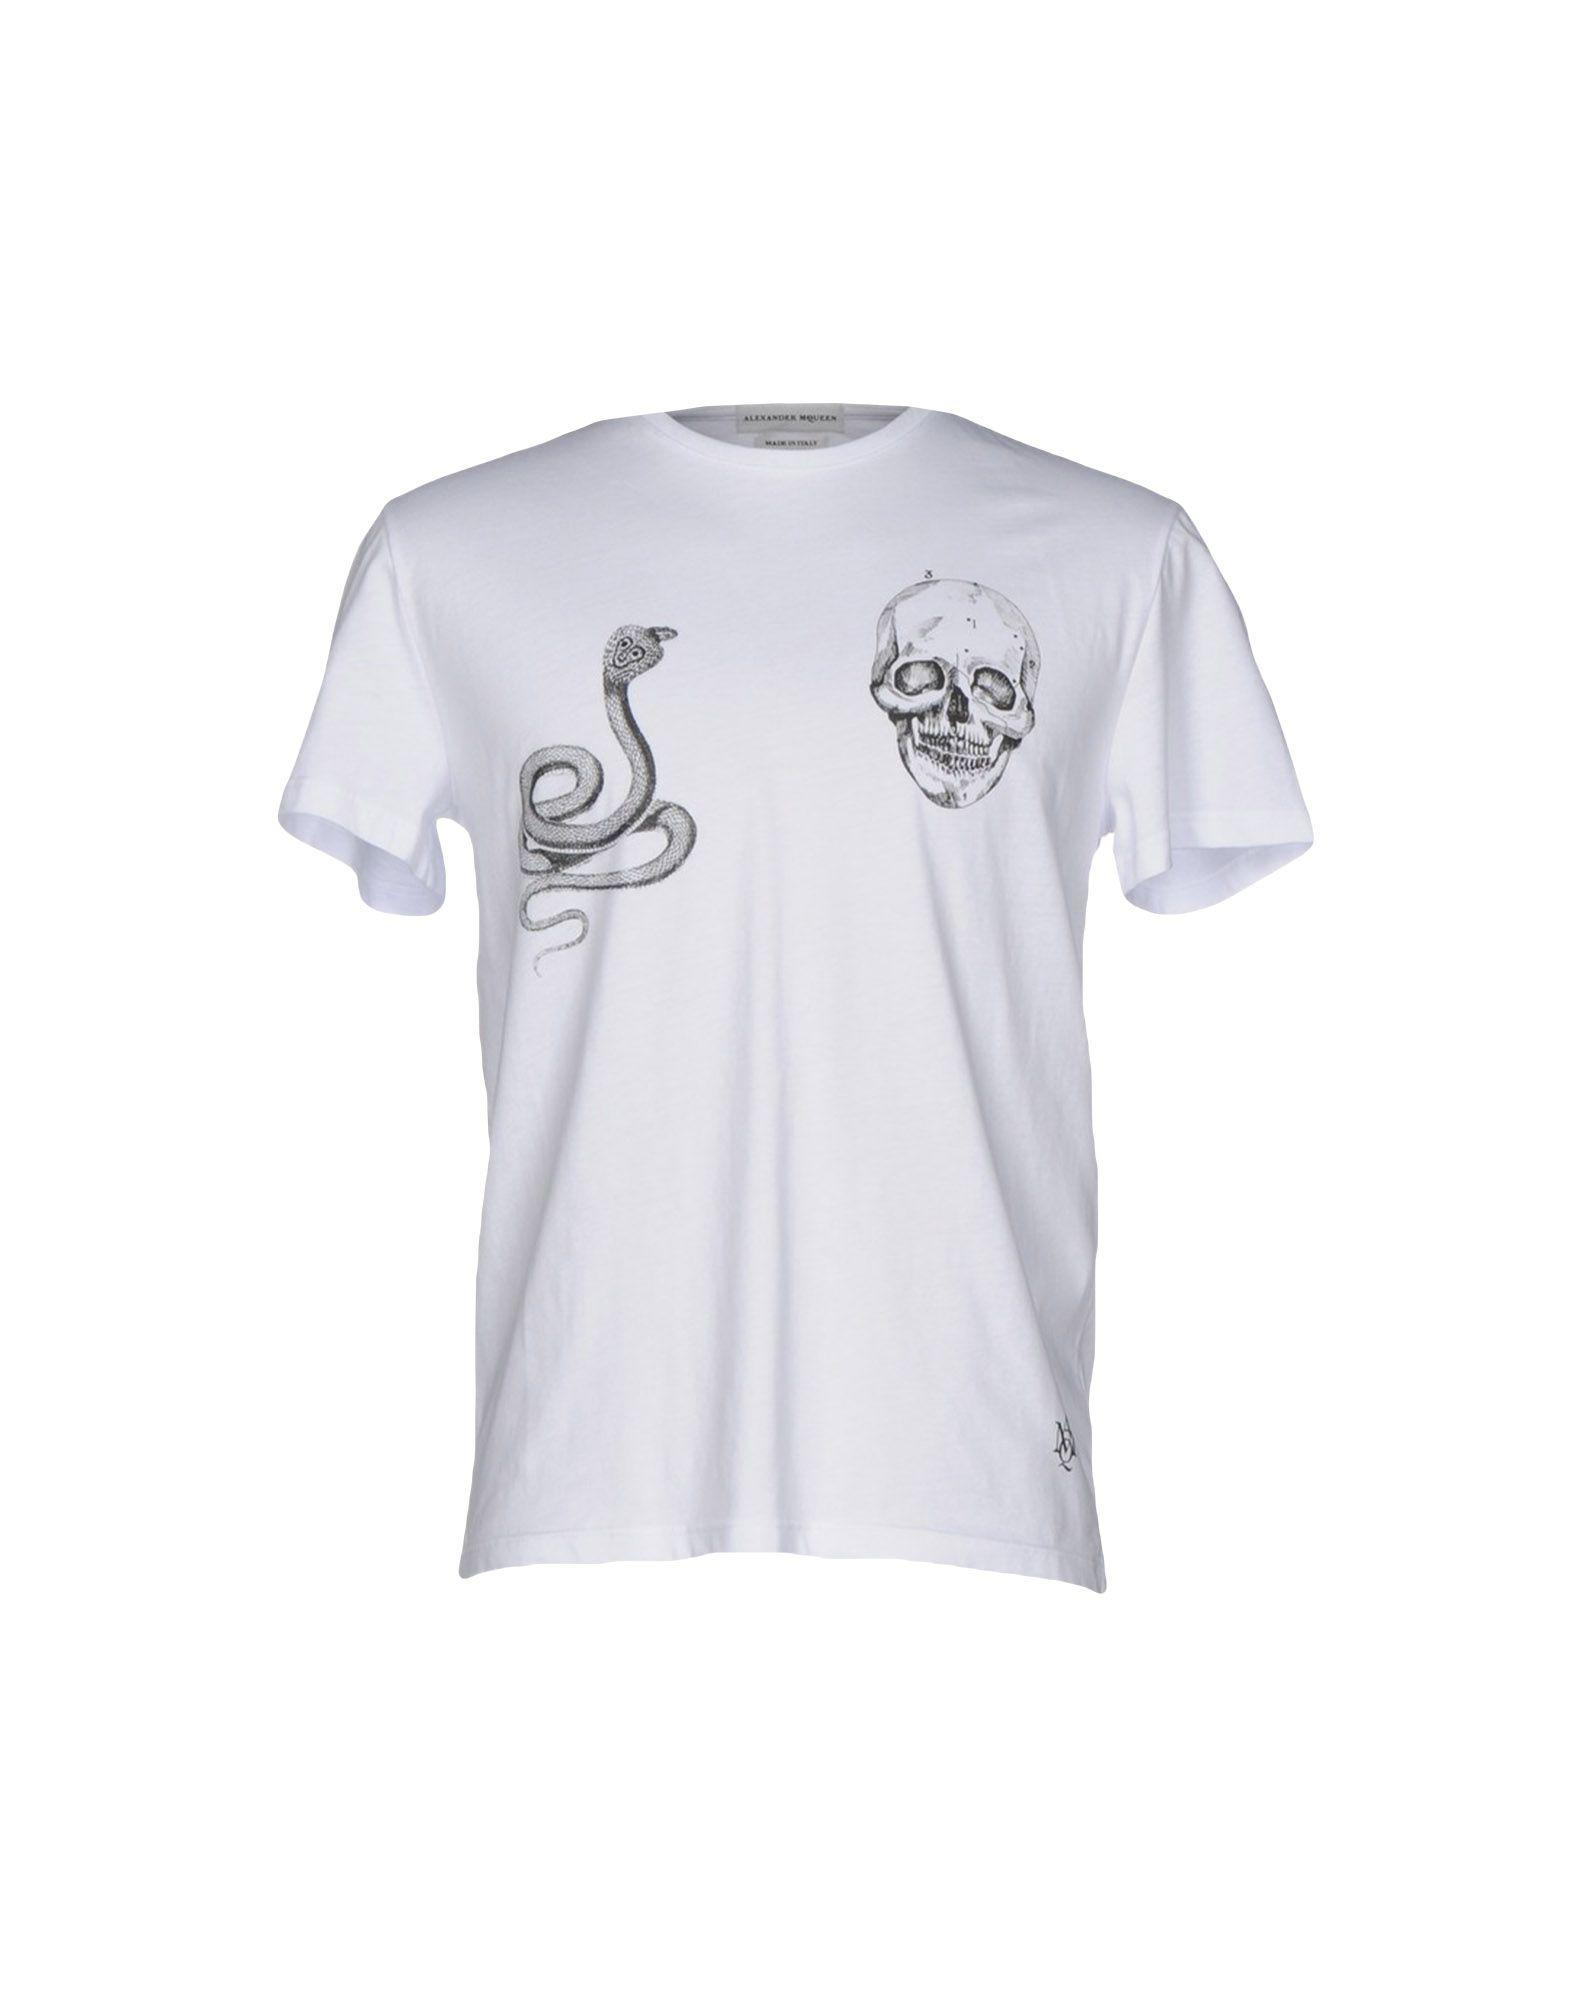 1b479c26 Lyst - Alexander McQueen T-shirt in White for Men